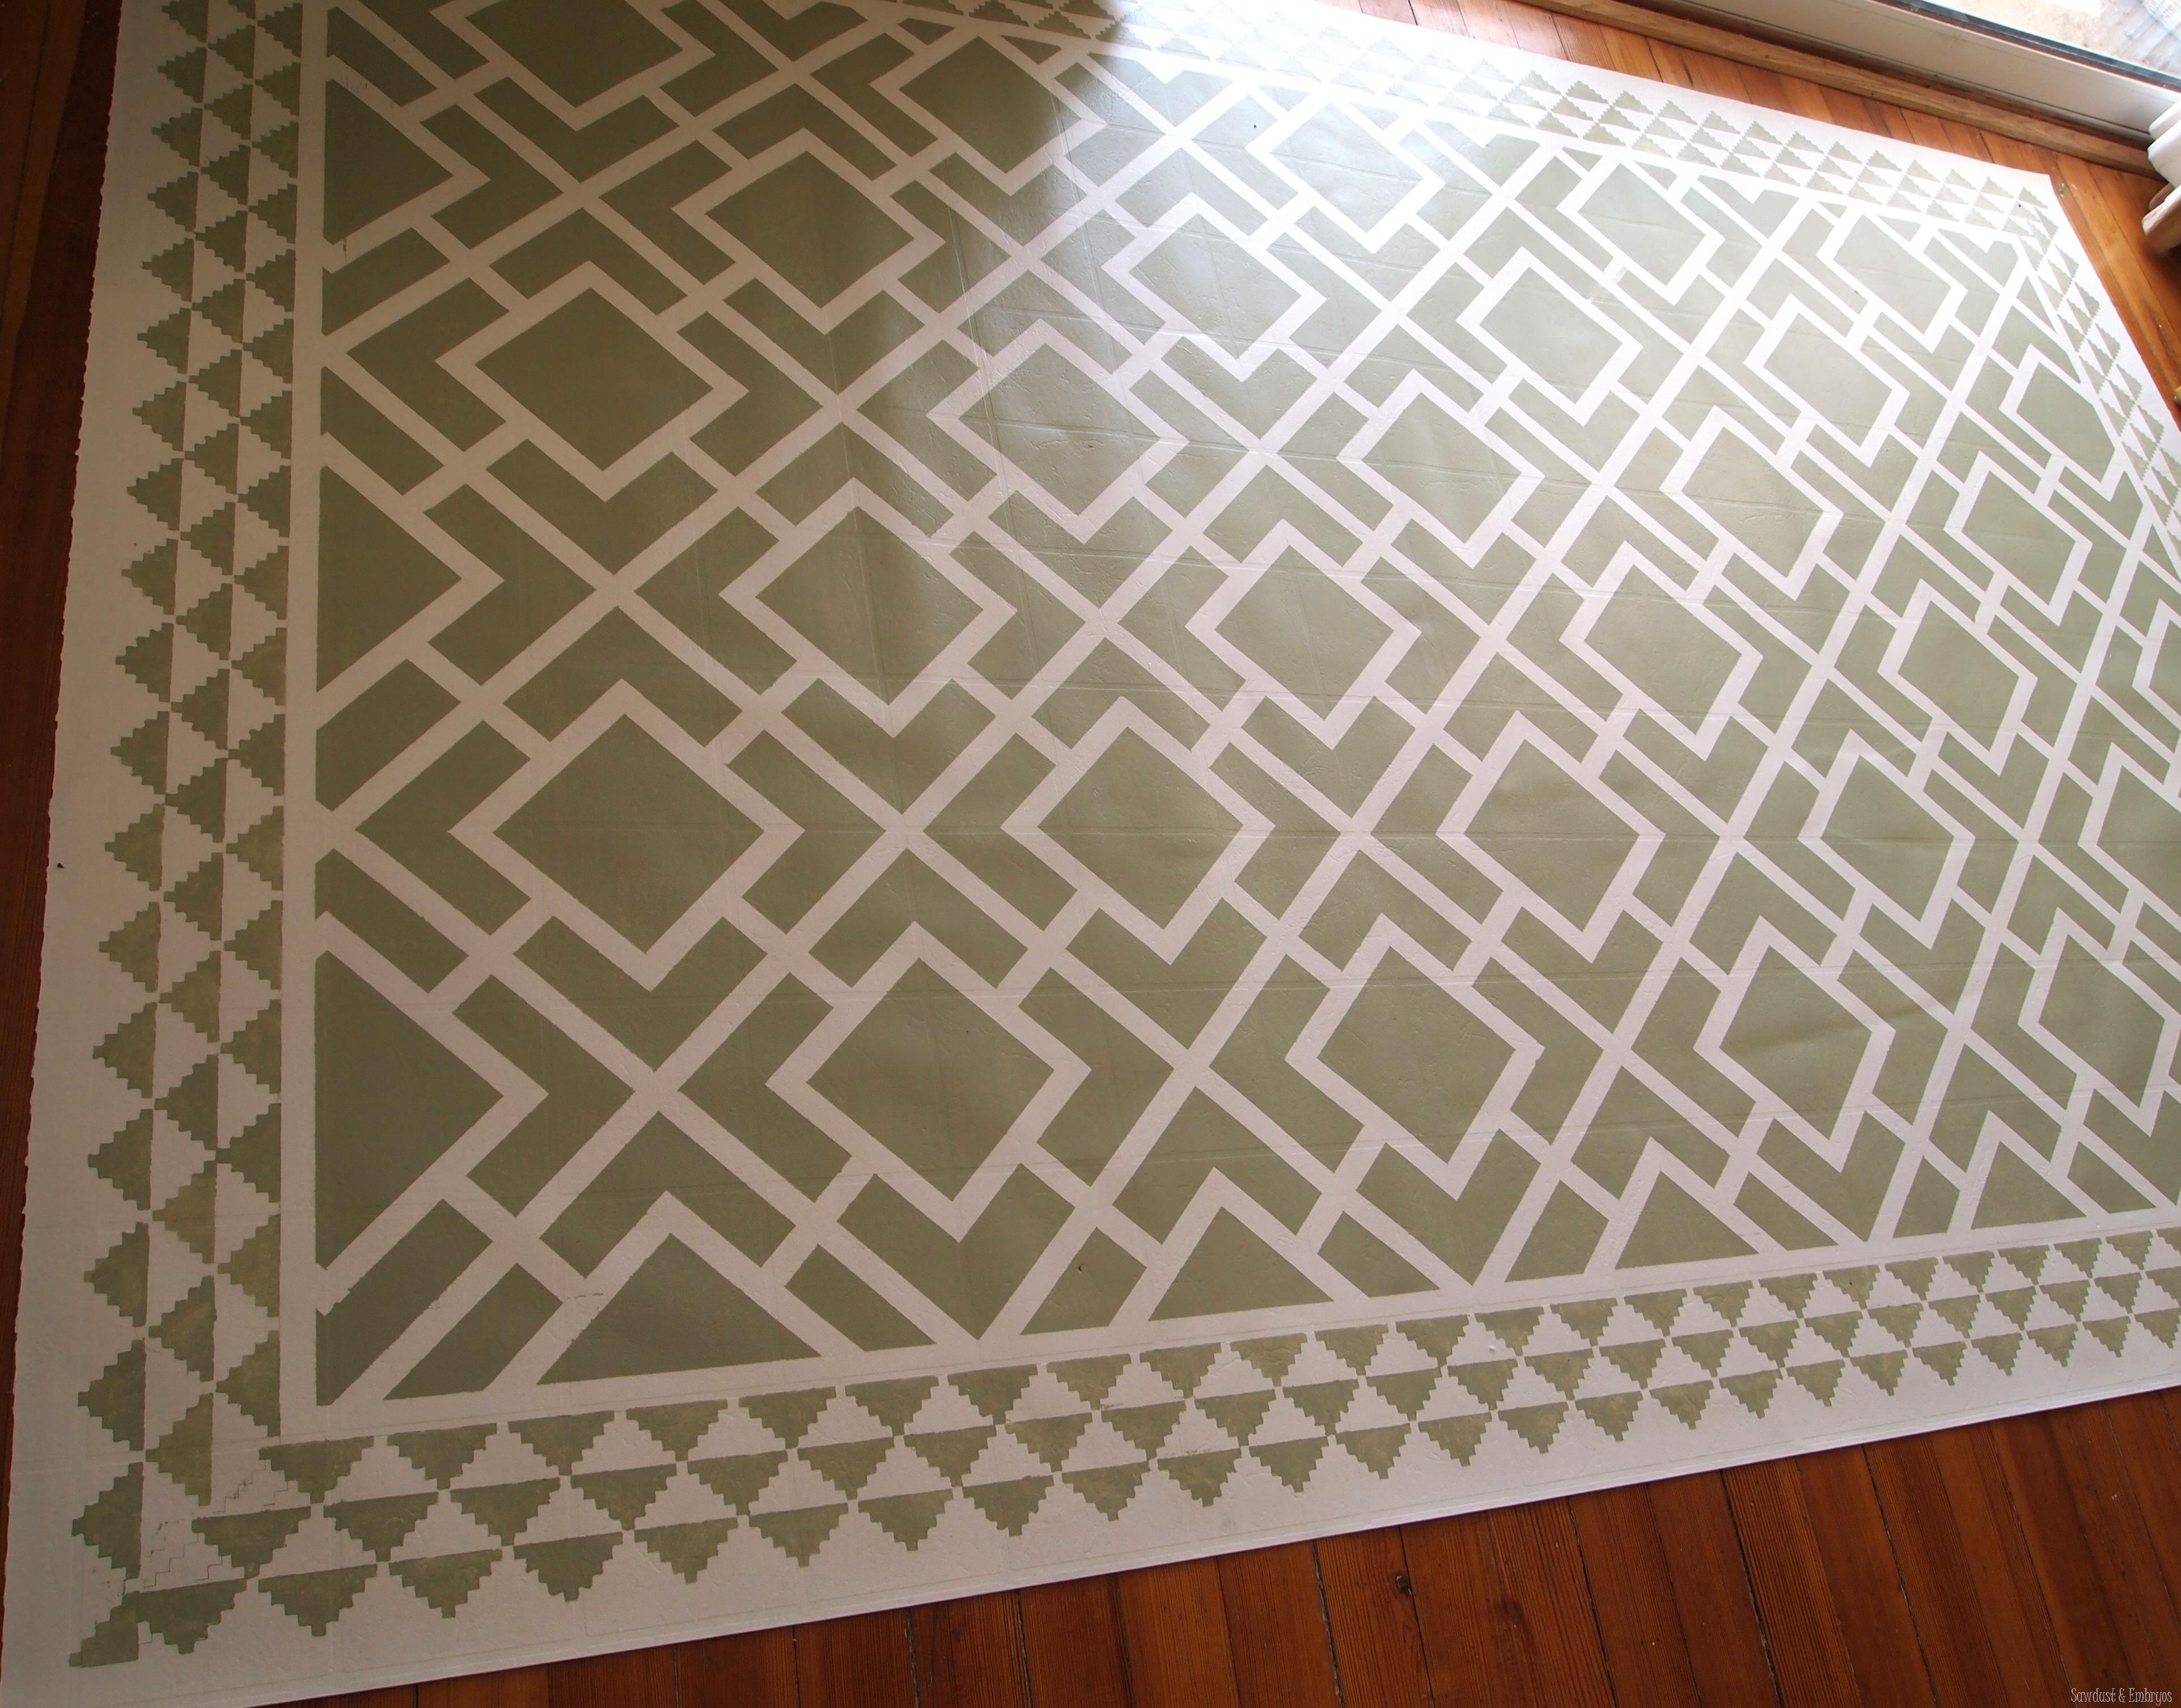 Vinyl Kitchen Floor Mats Diy Dining Room Area Rug Painted Linoleum Reality Daydream